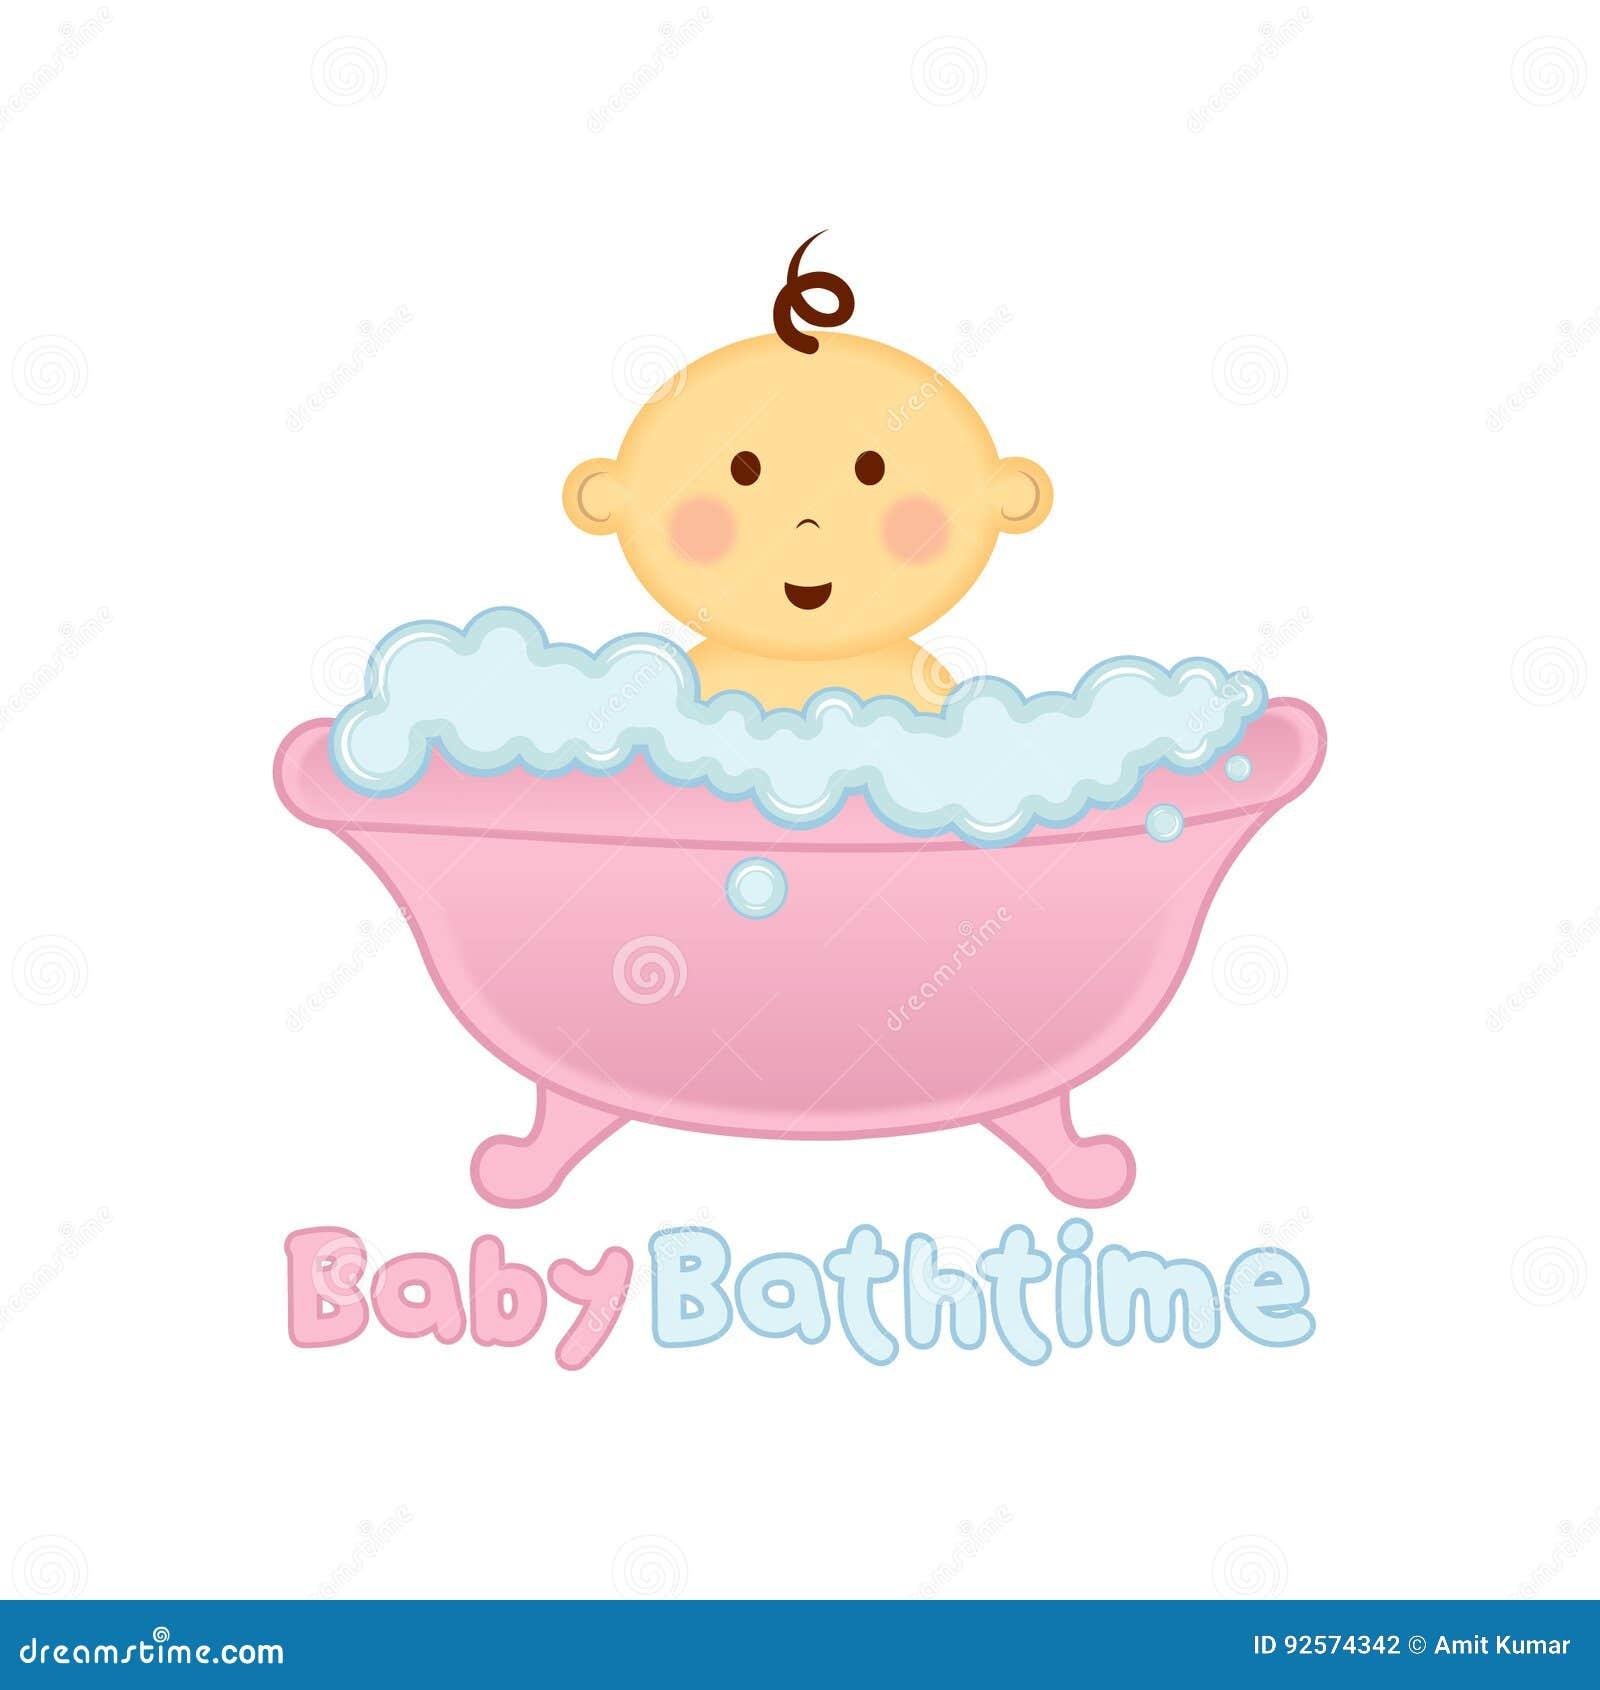 Baby Bath Time Logo Template, Baby Bathing Logo, Baby Shower Stock Vector